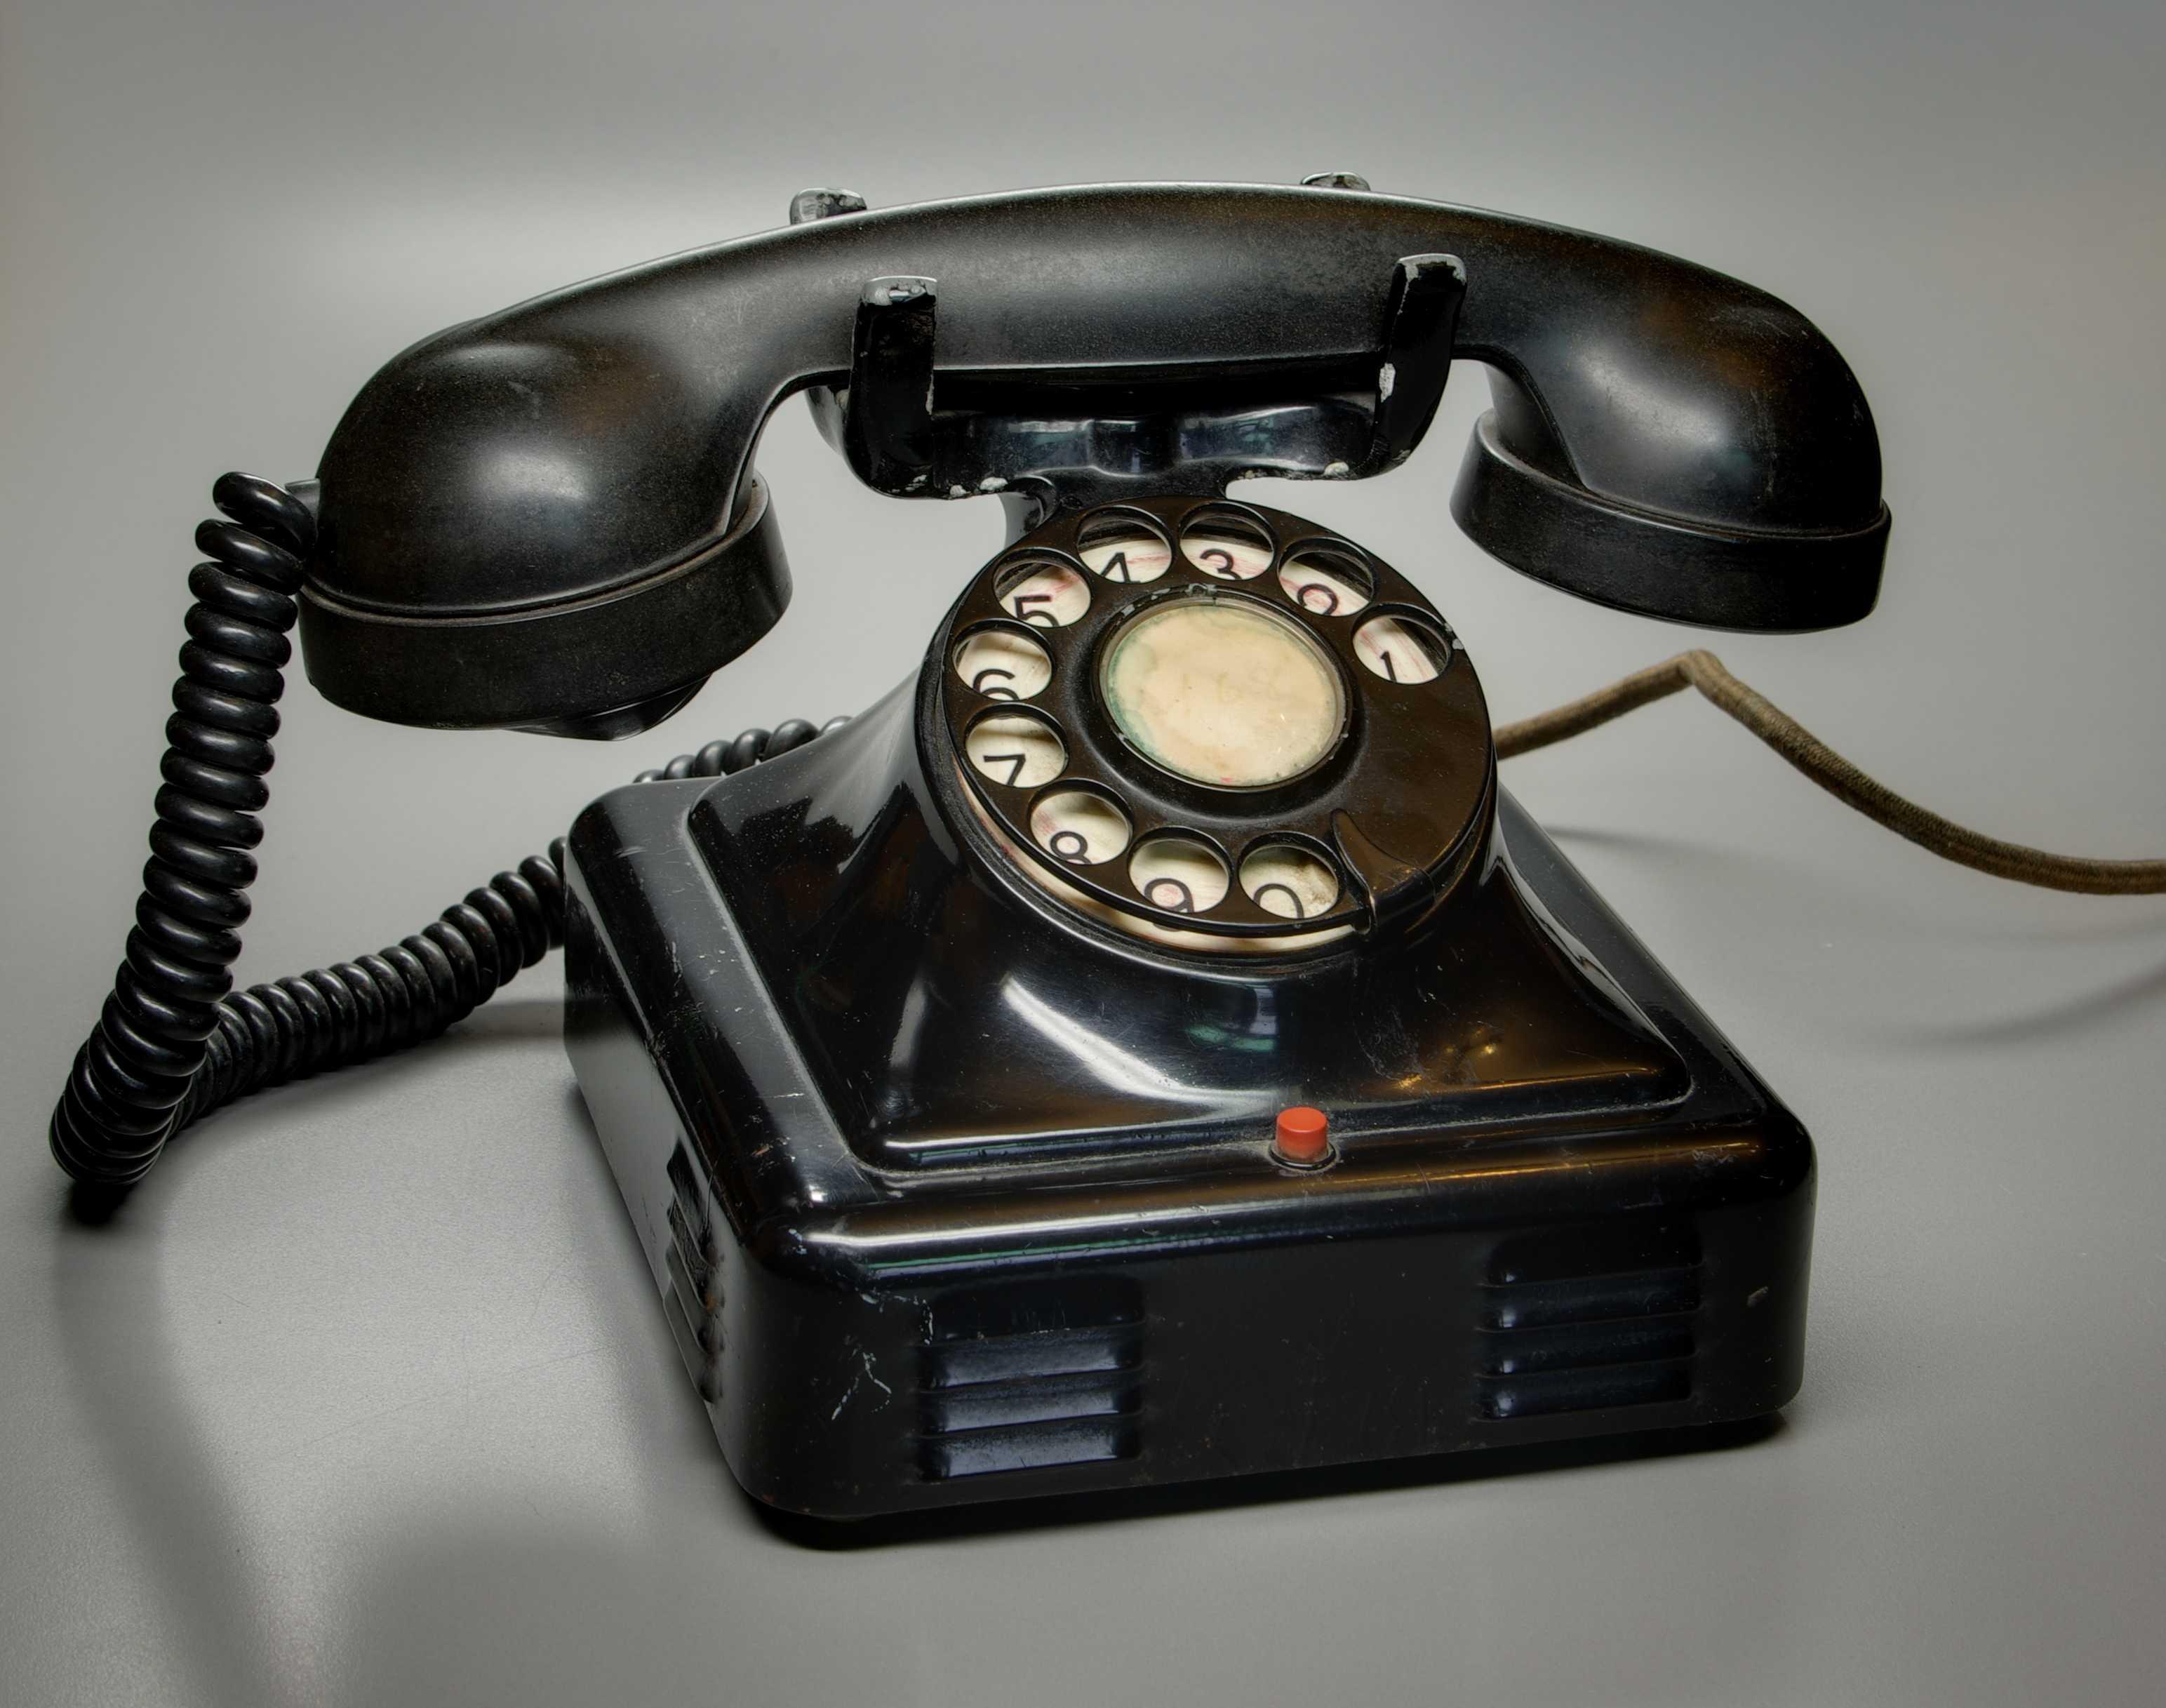 telefon1 - Telefon